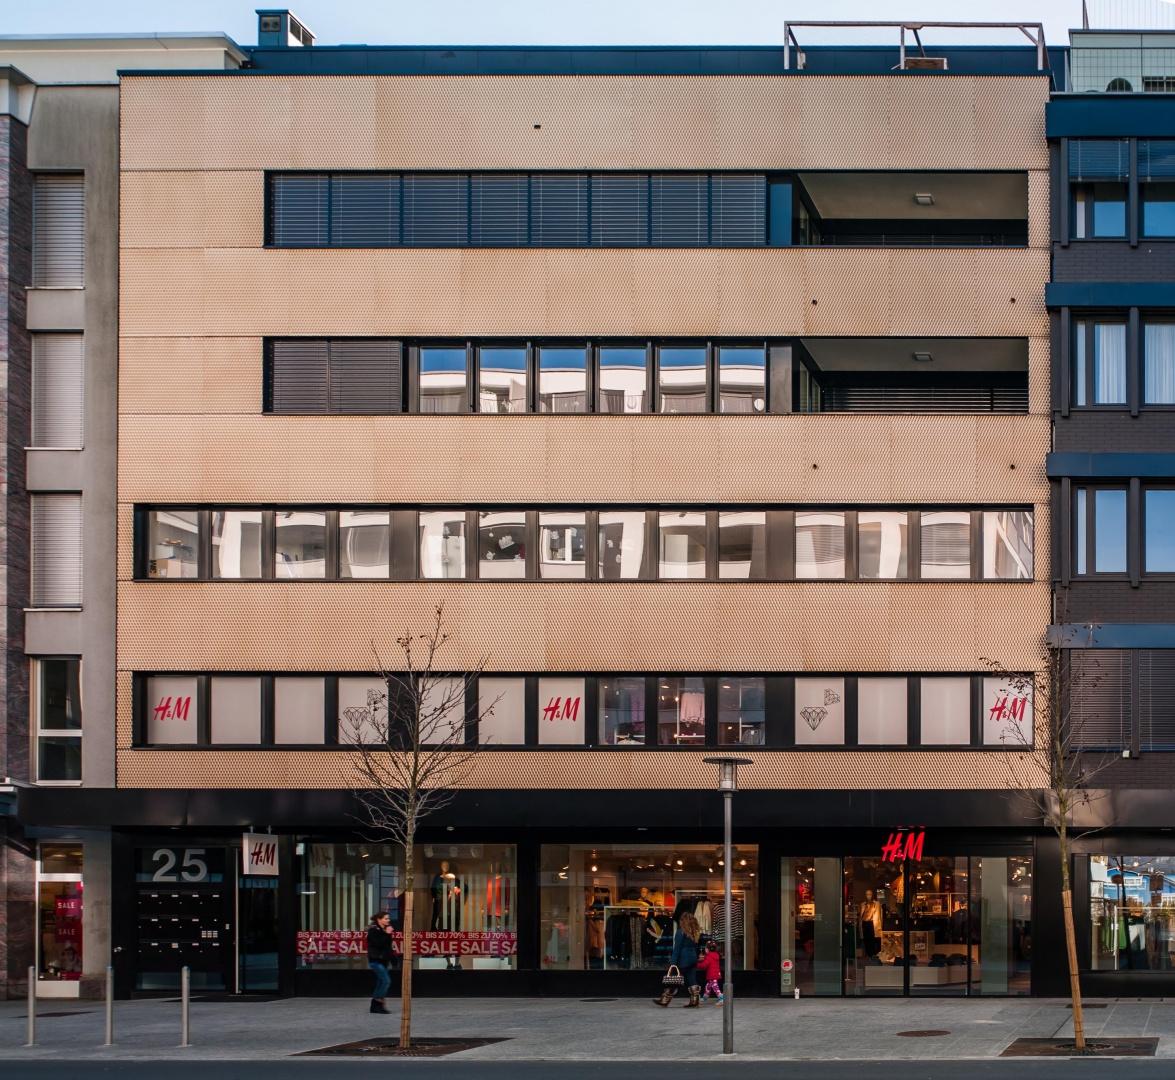 H6M Fassade © Bernd Göllnitz, BLGB Bildgestaltung